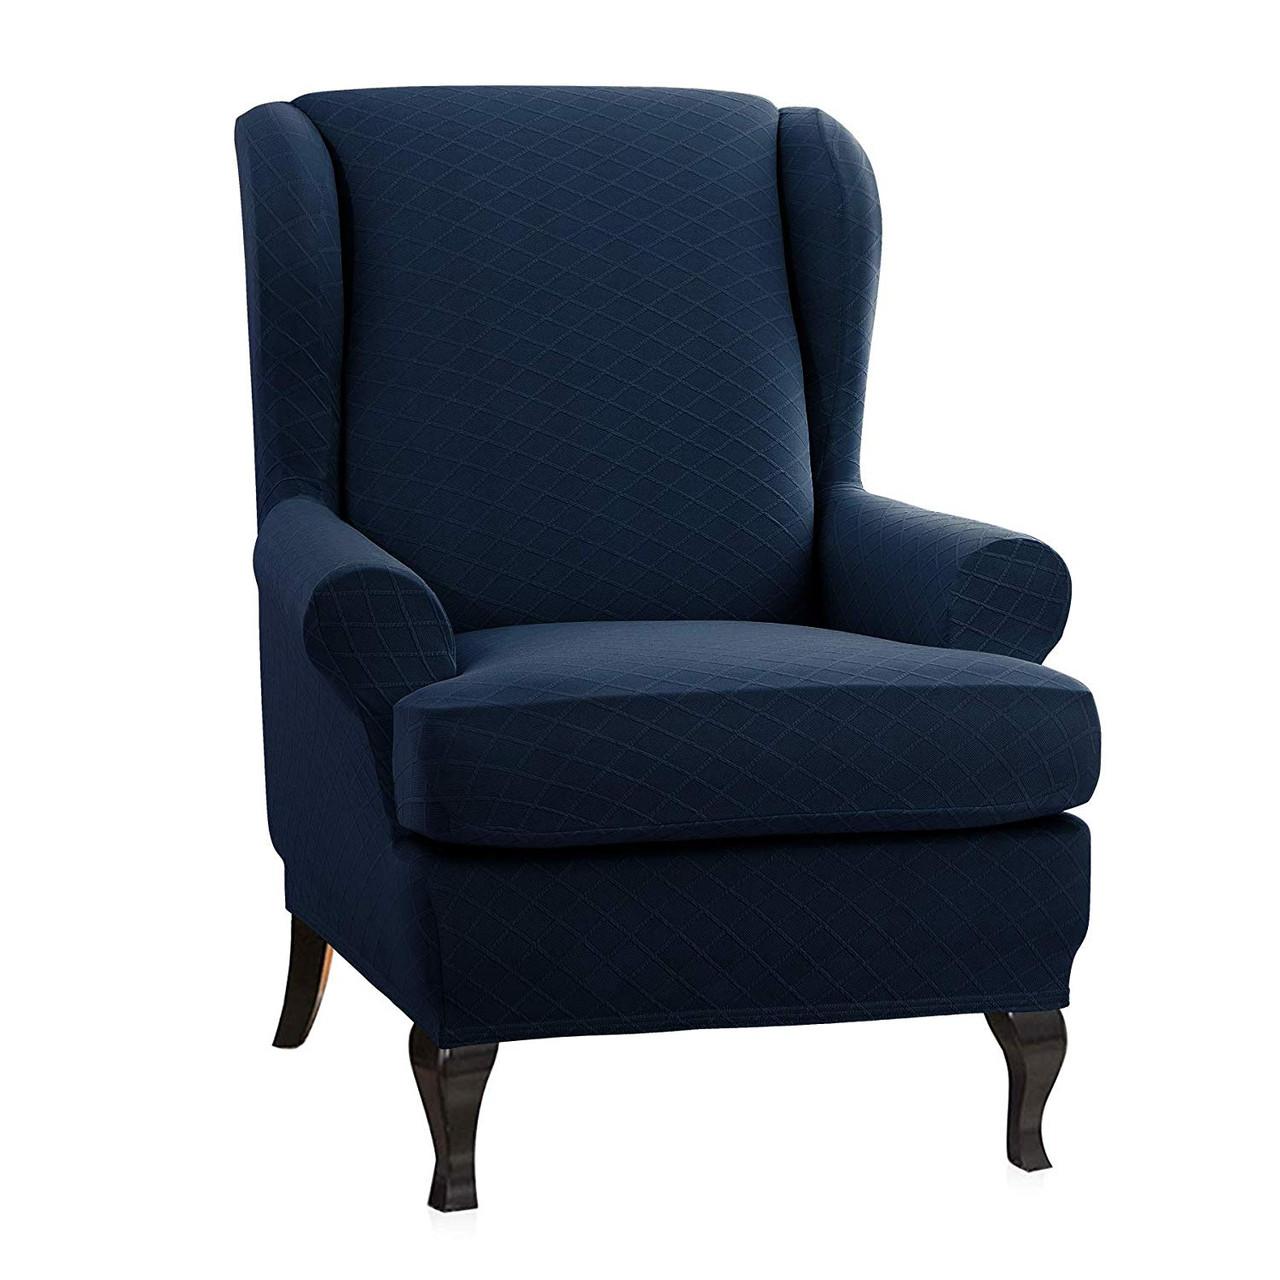 Dark Blue Super Stretch Rhombus Jacquard Spandex Fabric 2 Pieces T Cushion Wingback Slipcover Enova Home